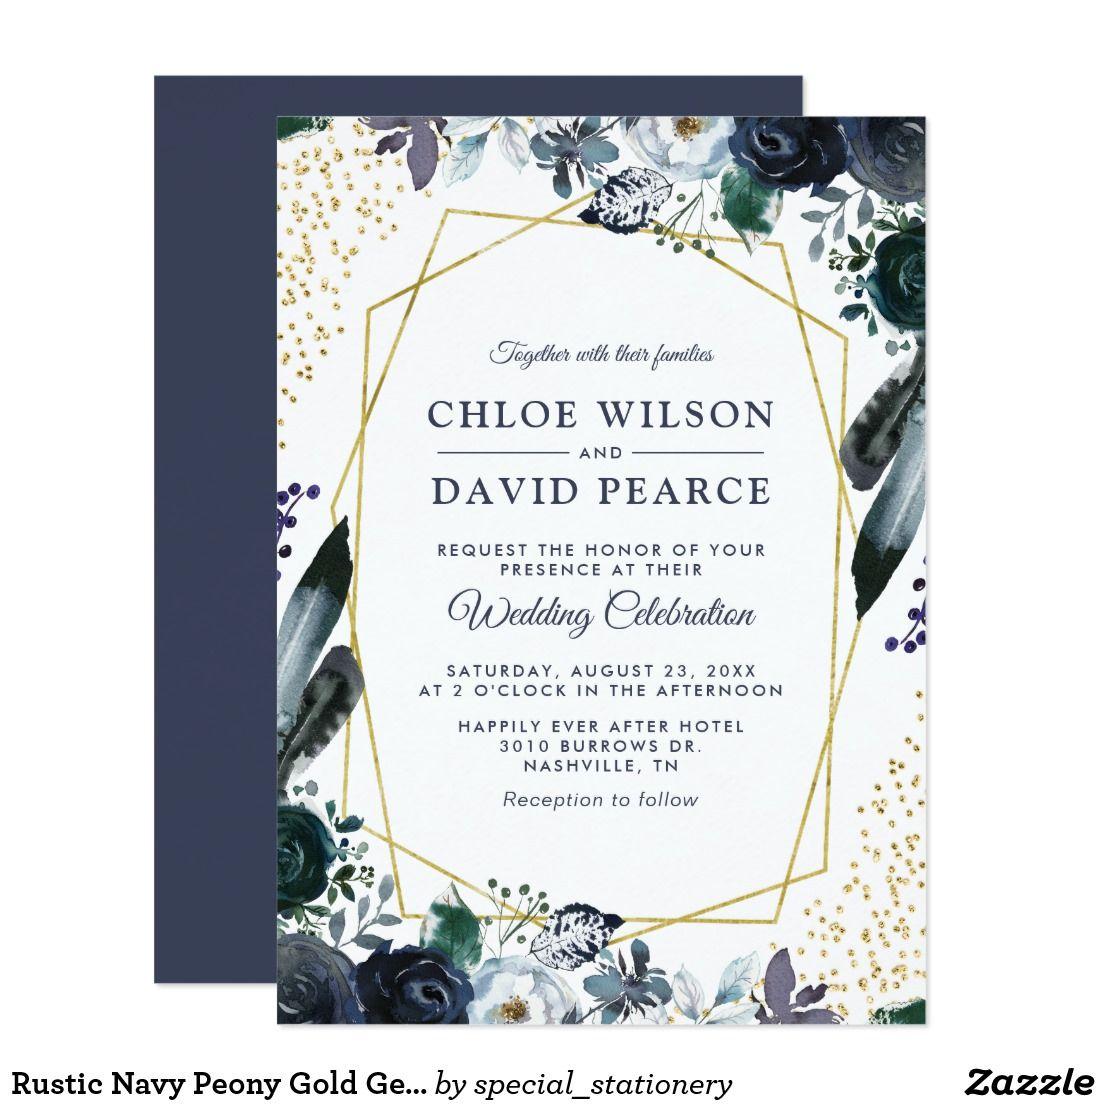 Zazzle Wedding Invitations.Rustic Navy Peony Gold Geometric Frame Wedding Invitation Zazzle